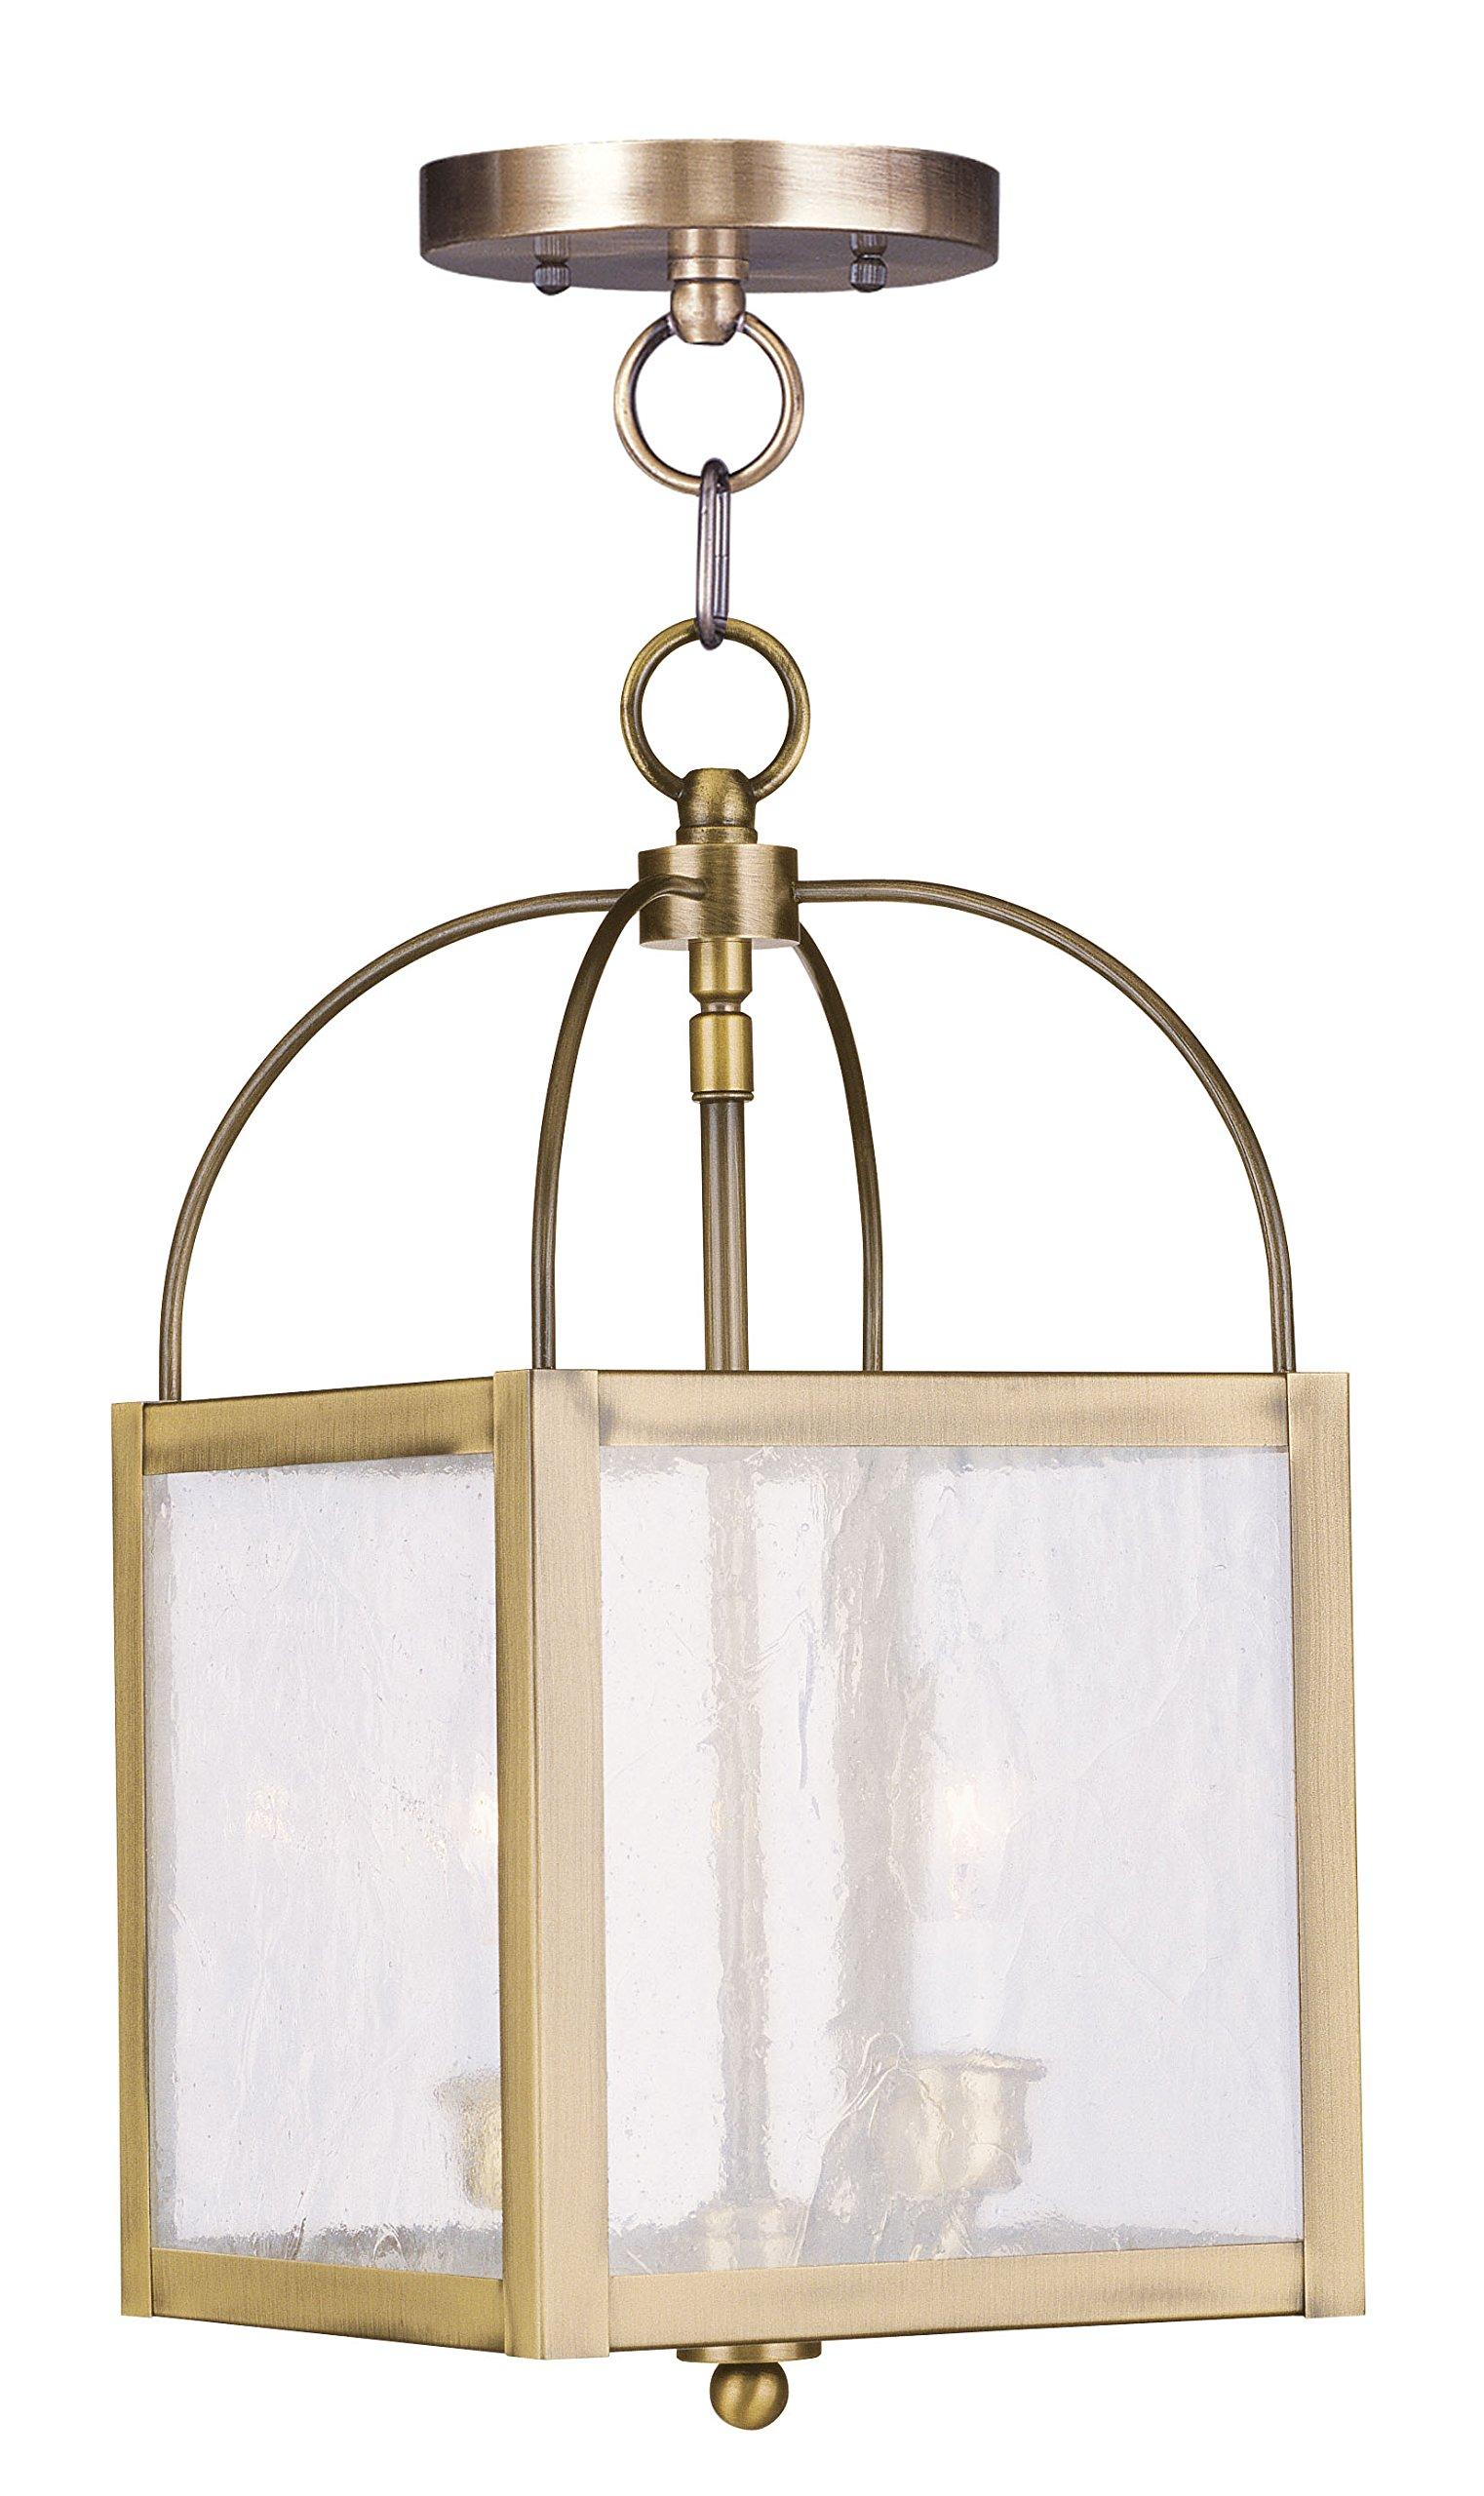 Livex Lighting 4045-01 Milford 2-Light Convertible Hanging Lantern/Ceiling Mount, Antique Brass